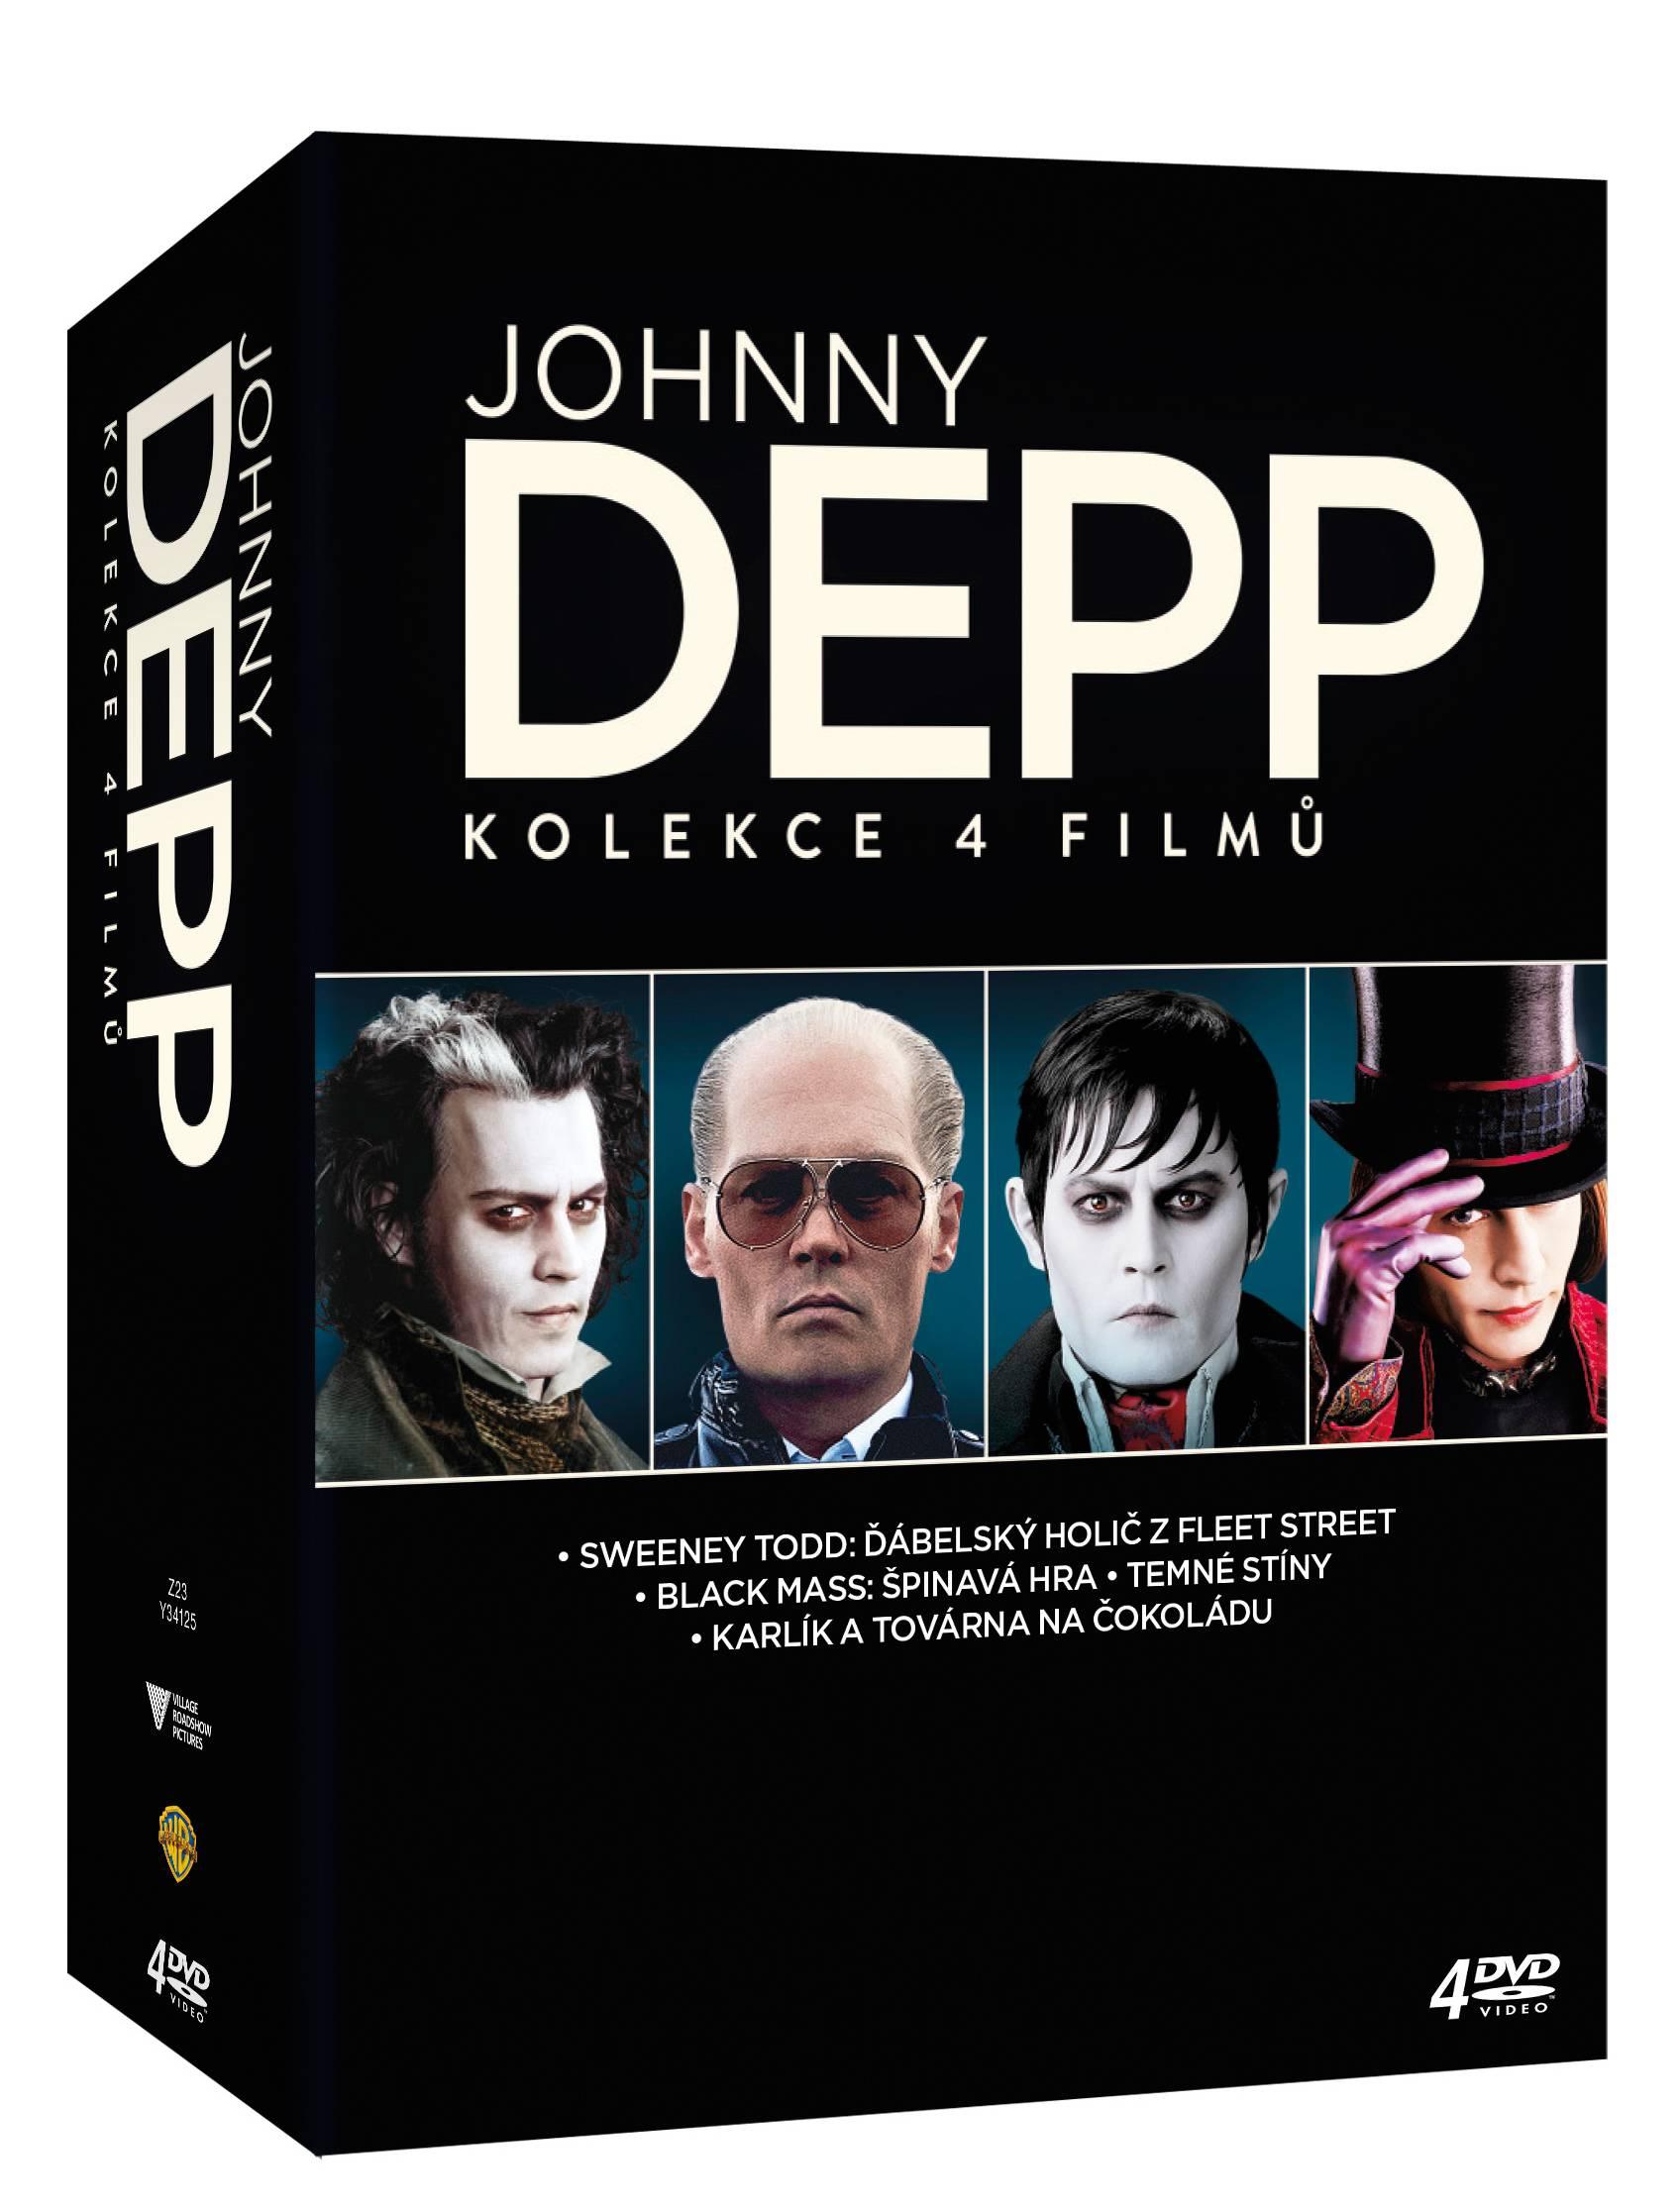 JOHNNY DEPP KOLEKCE - 4 DVD